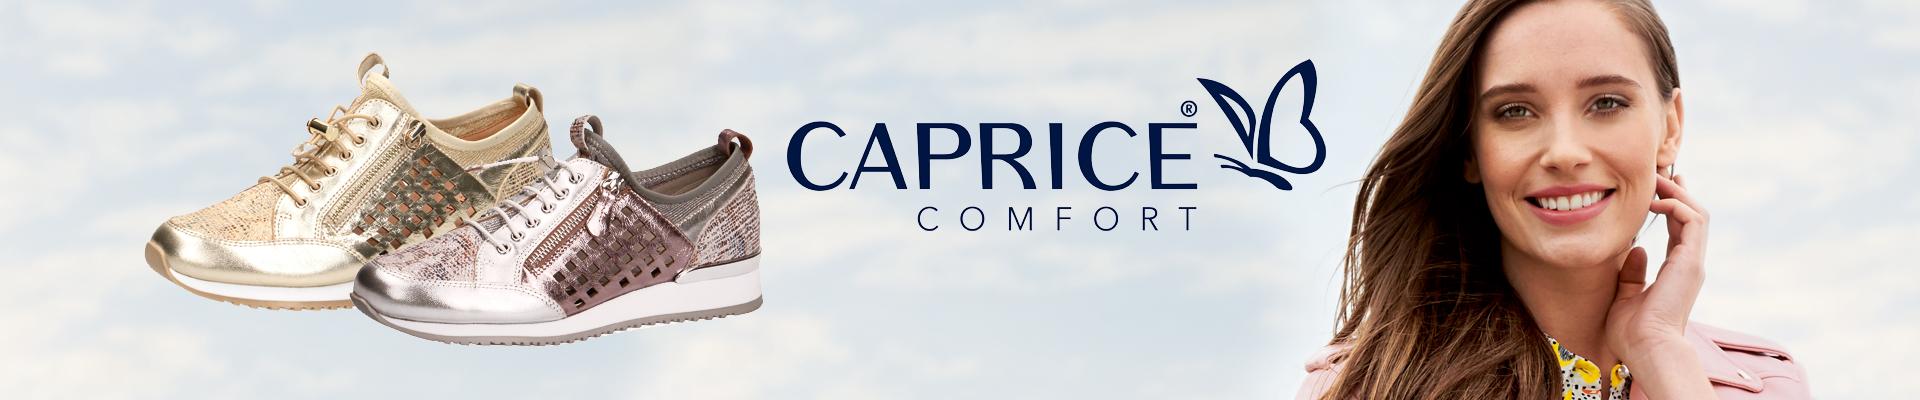 Caprice comfort